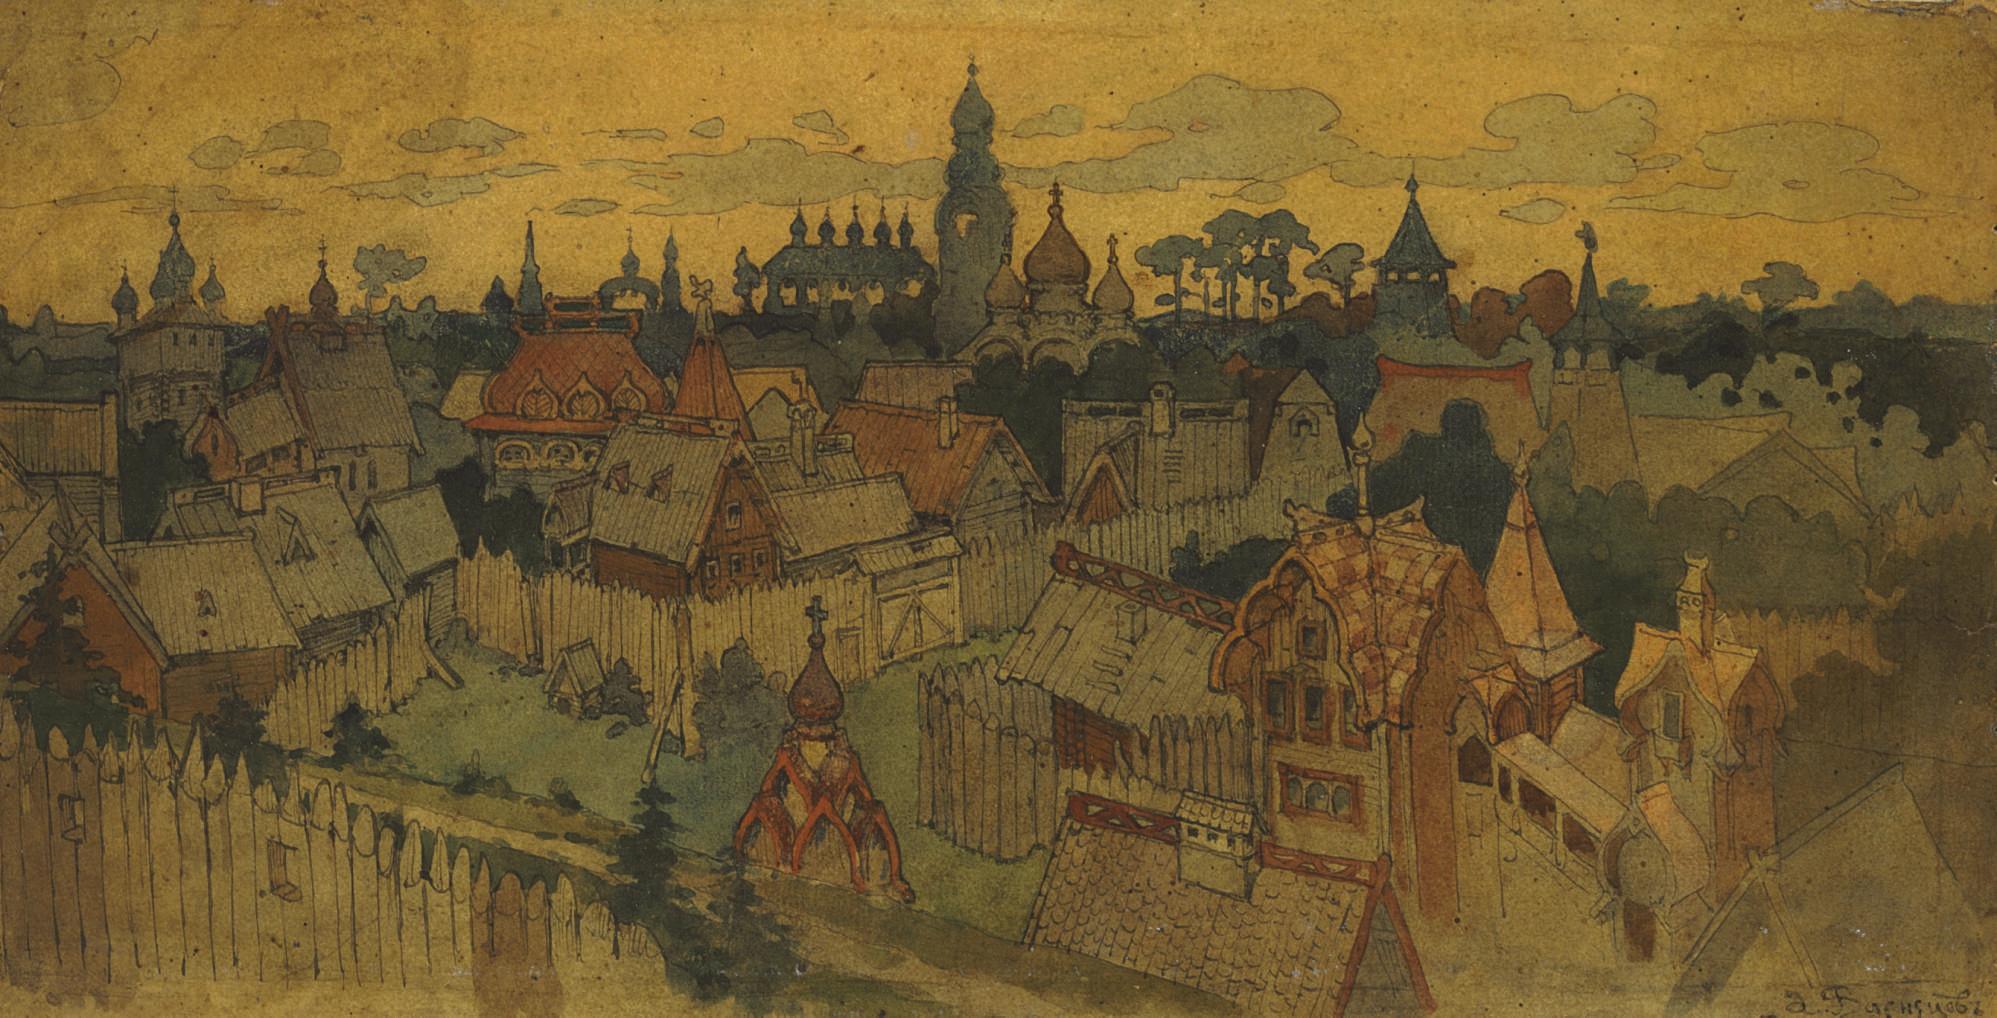 Stage design for Rimskii-Korsakov's opera The Legend of the Invisible City of Kitezh